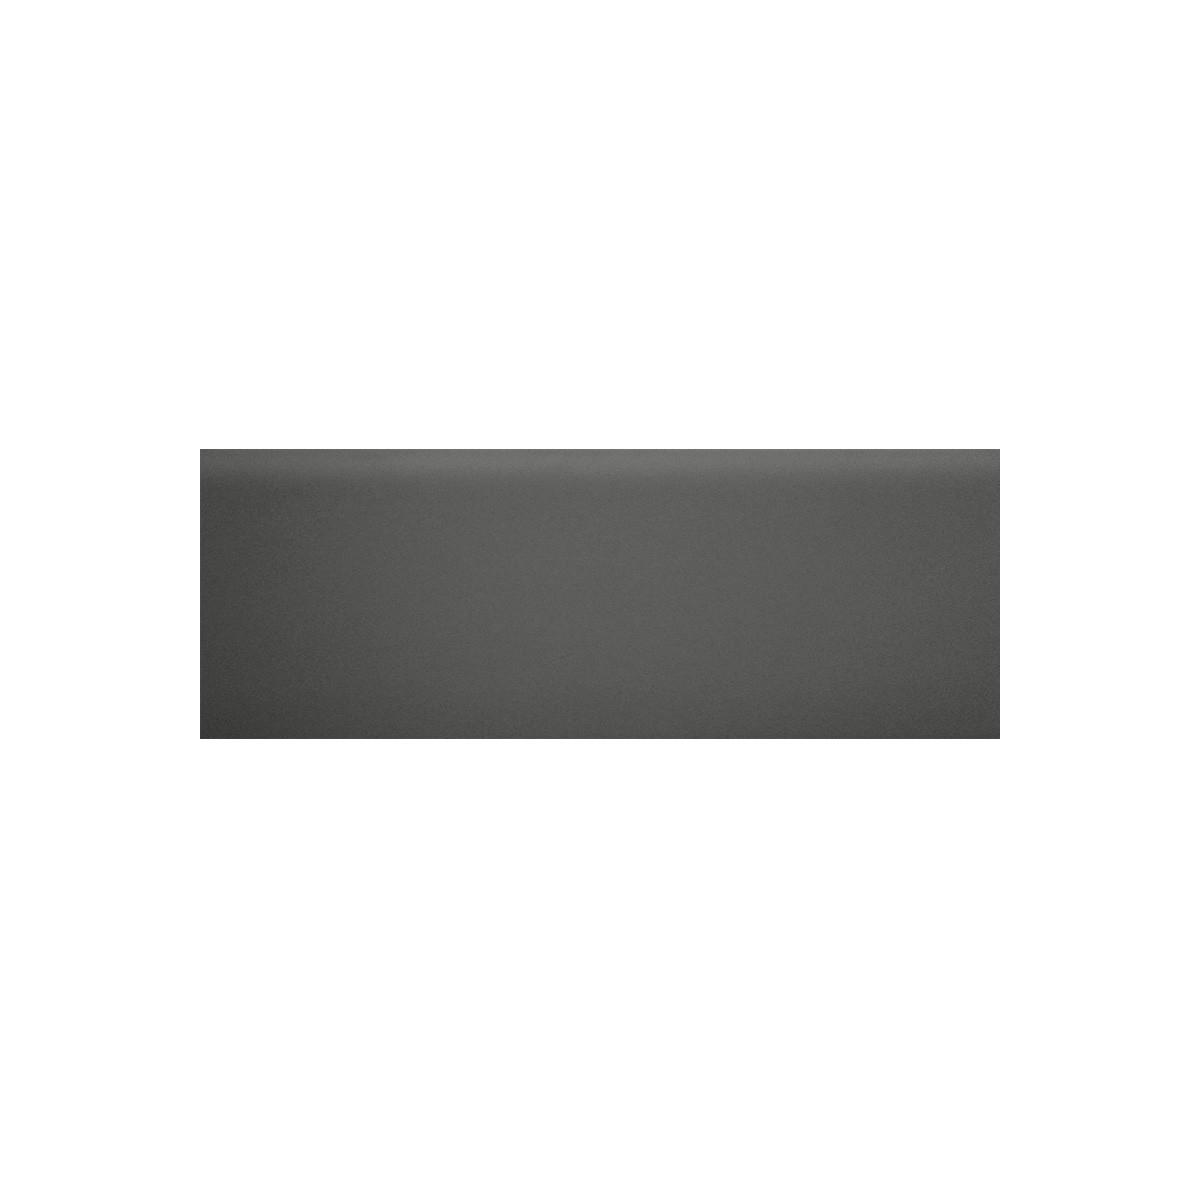 Rodapié Gris Victorian 7,5x20 (ud) - Colores lisos para combinar - Marca Mainzu